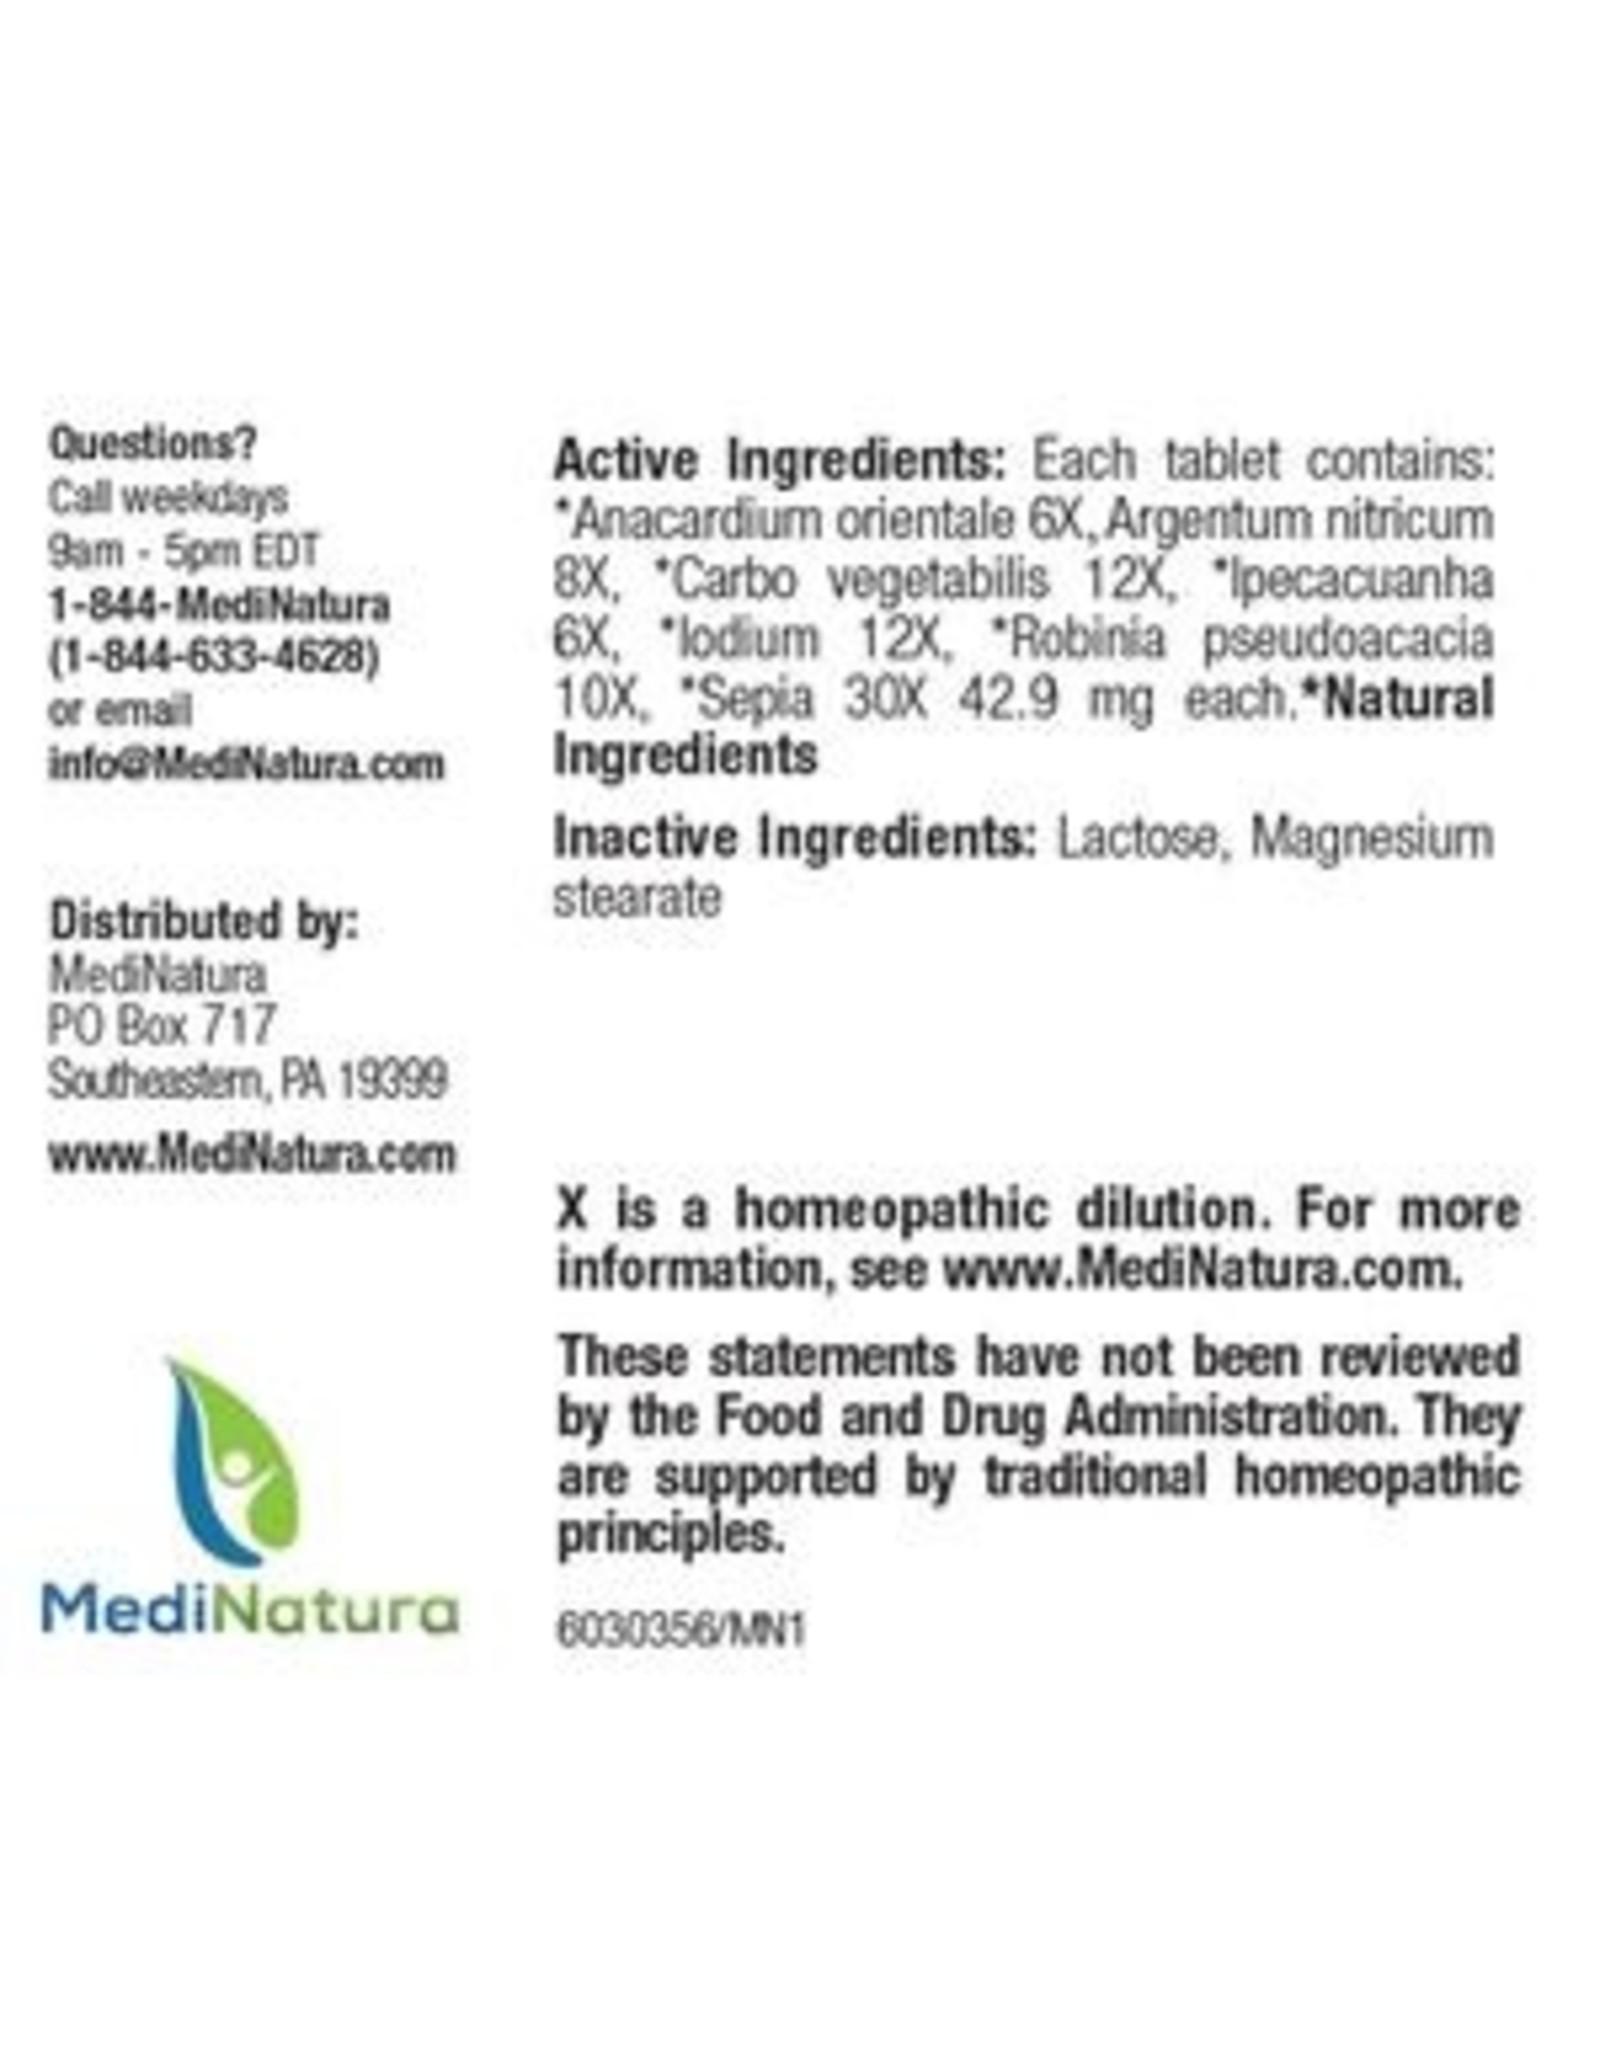 MediNatura BHI Nausea Tablets (100ct)